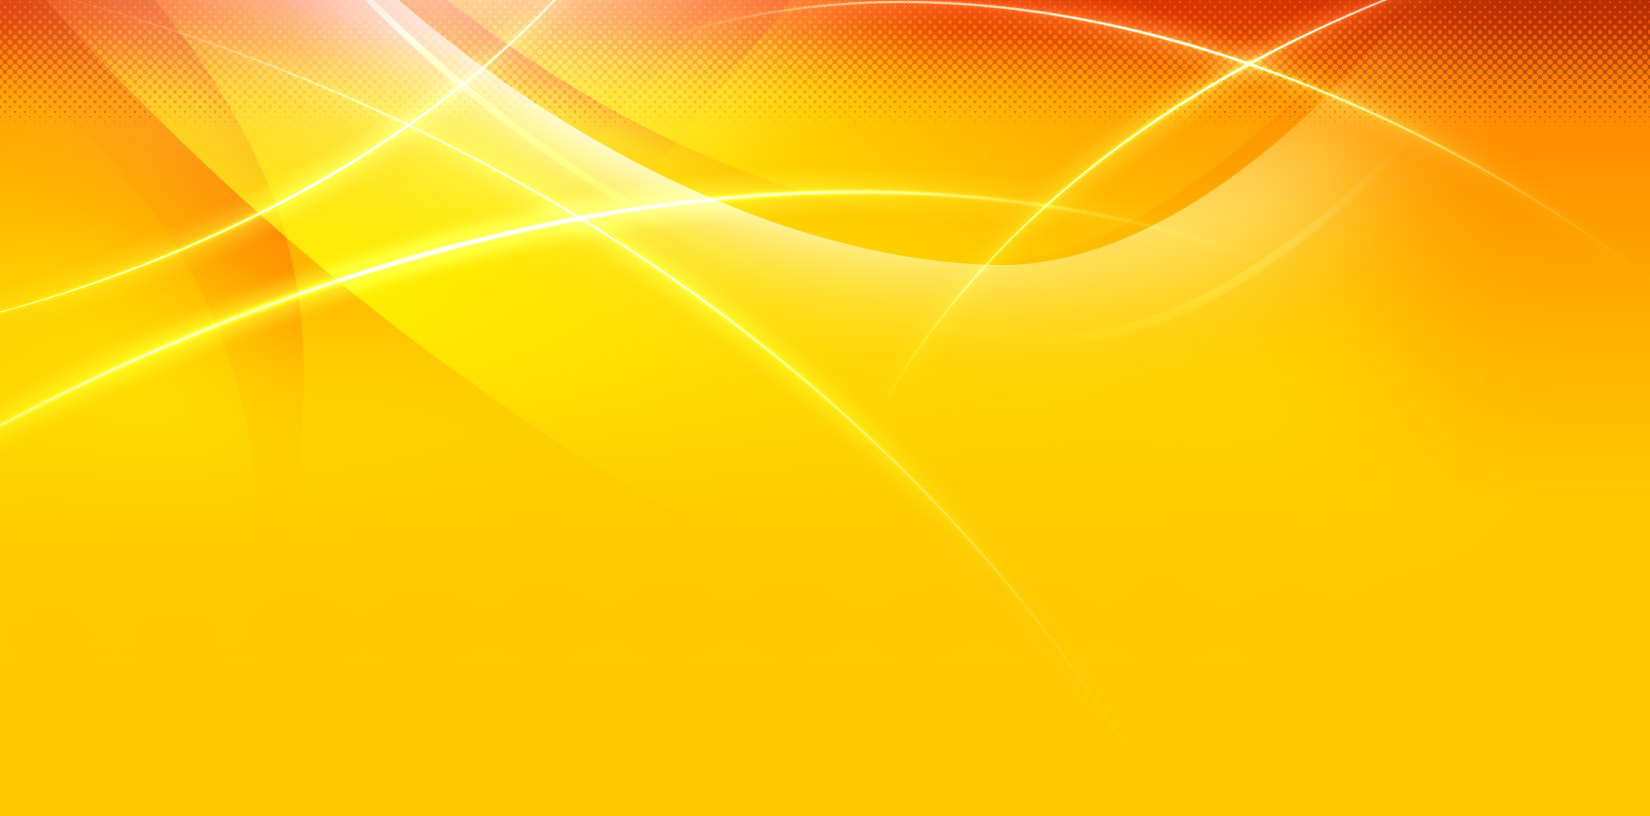 Background Orange Page 1